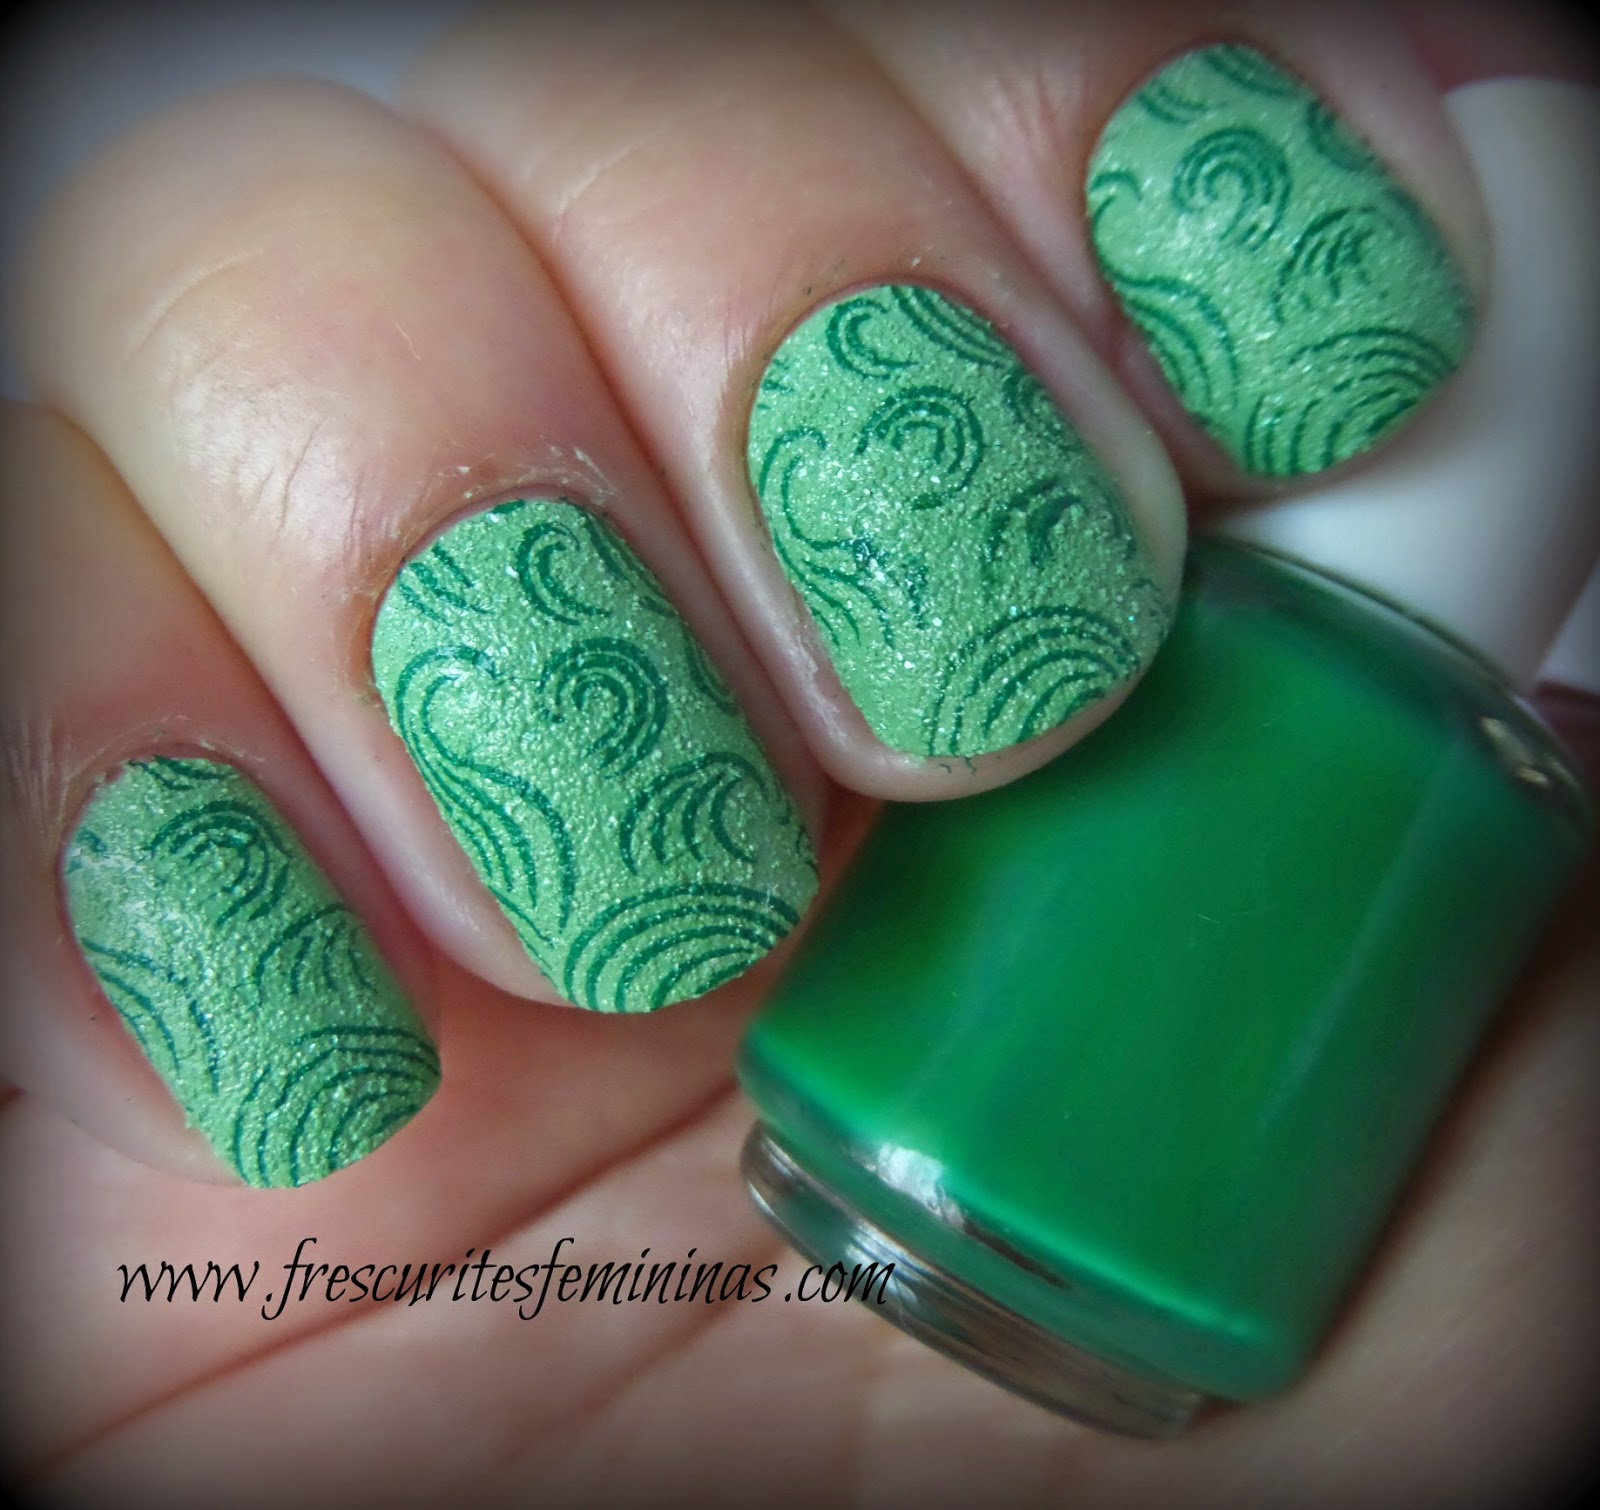 L.A. Girl, Green Sand, Frescurites Femininas, Green nail polish, Esmalte, mundo de unas